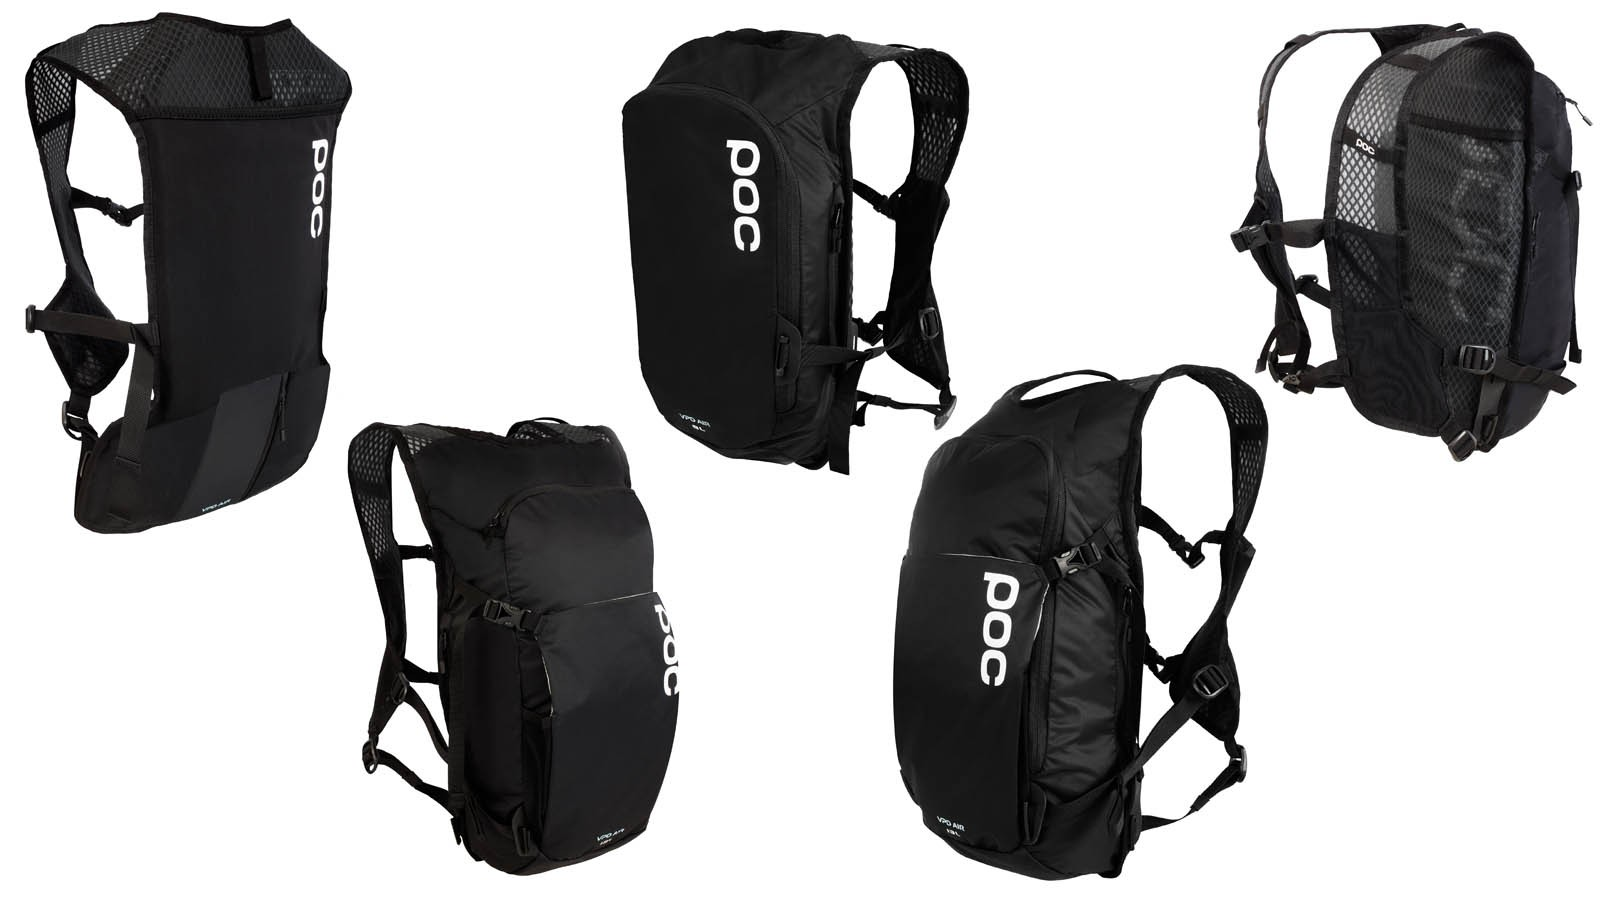 The Spine VPD bags feature EN 1621-1 back protectors